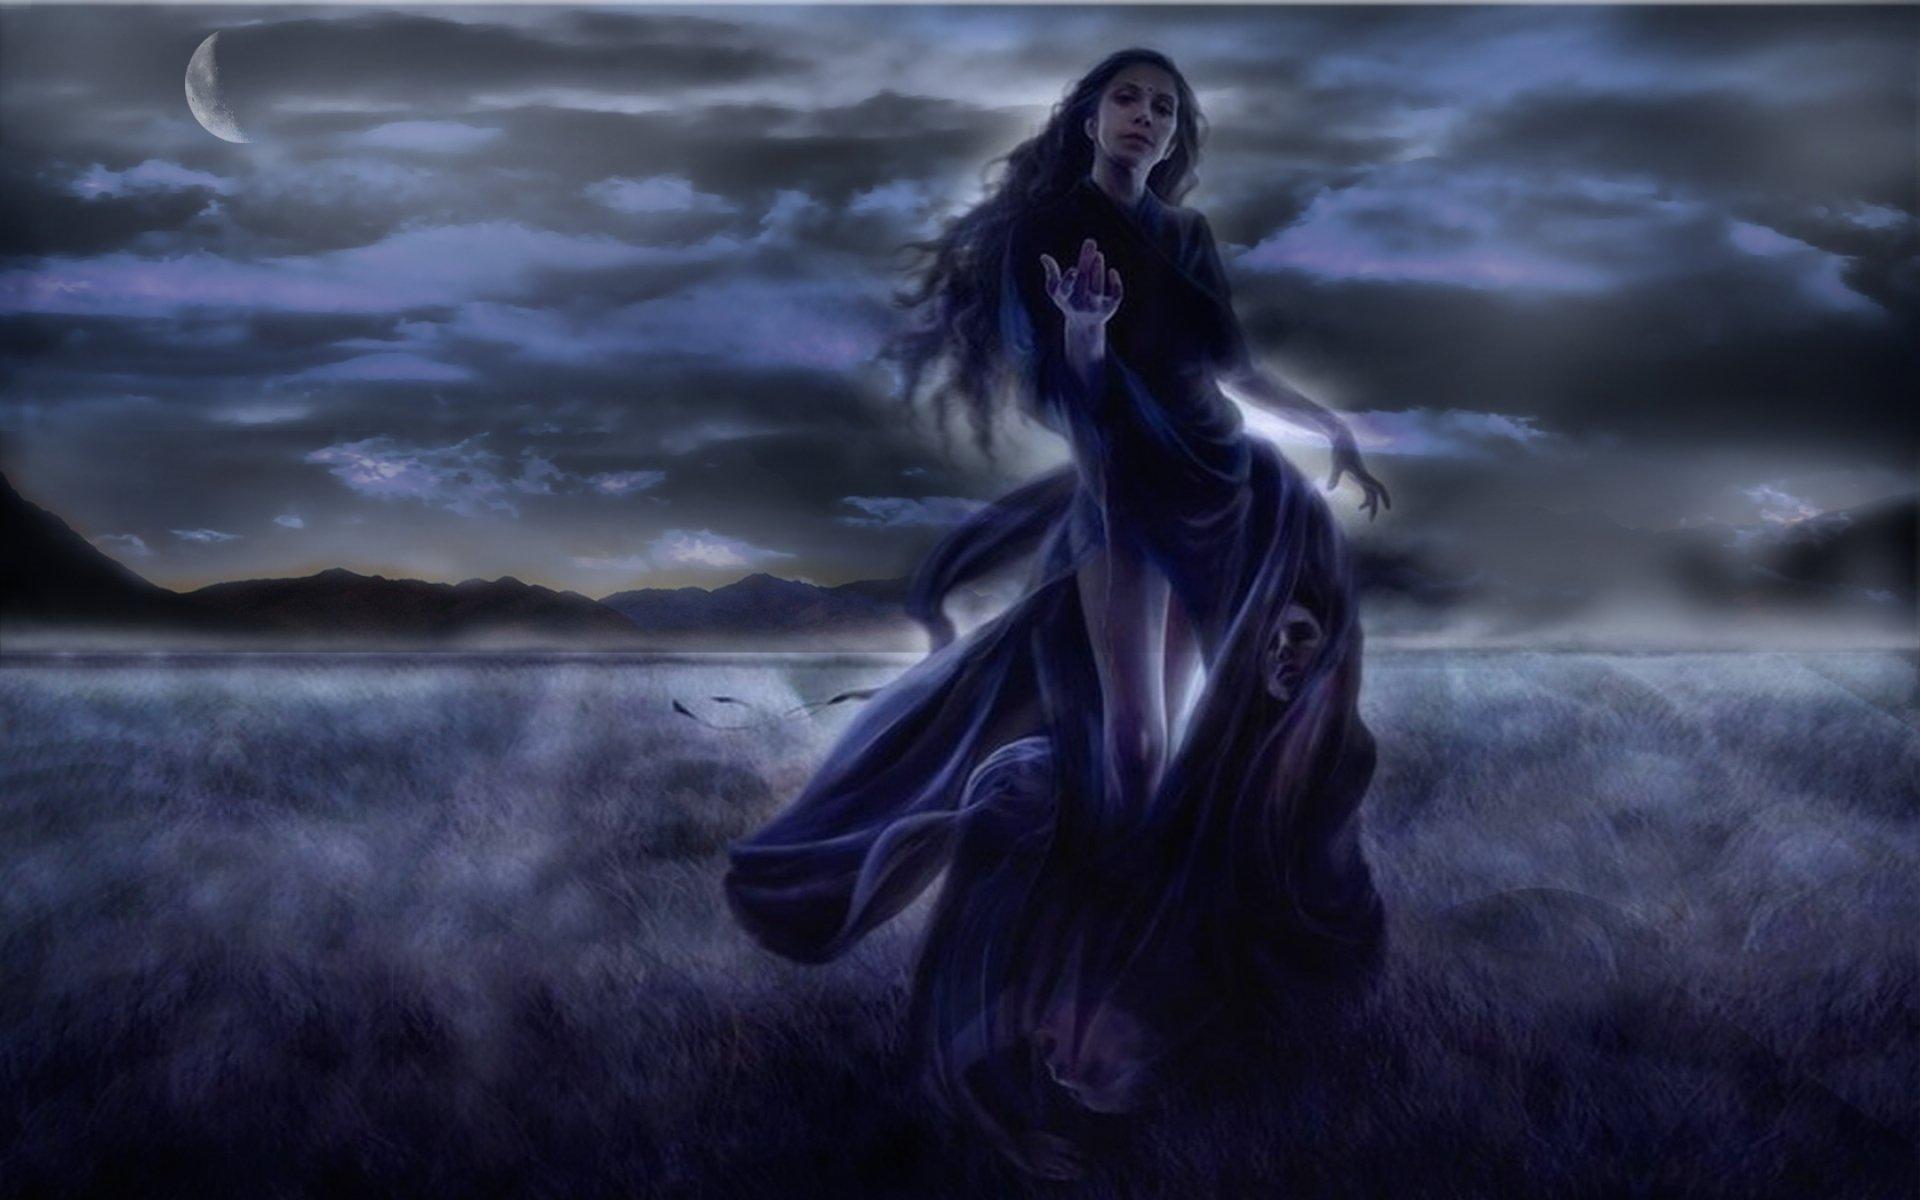 Dark Gothic Art Artwork Fantasy J Wallpaper  1920x1200